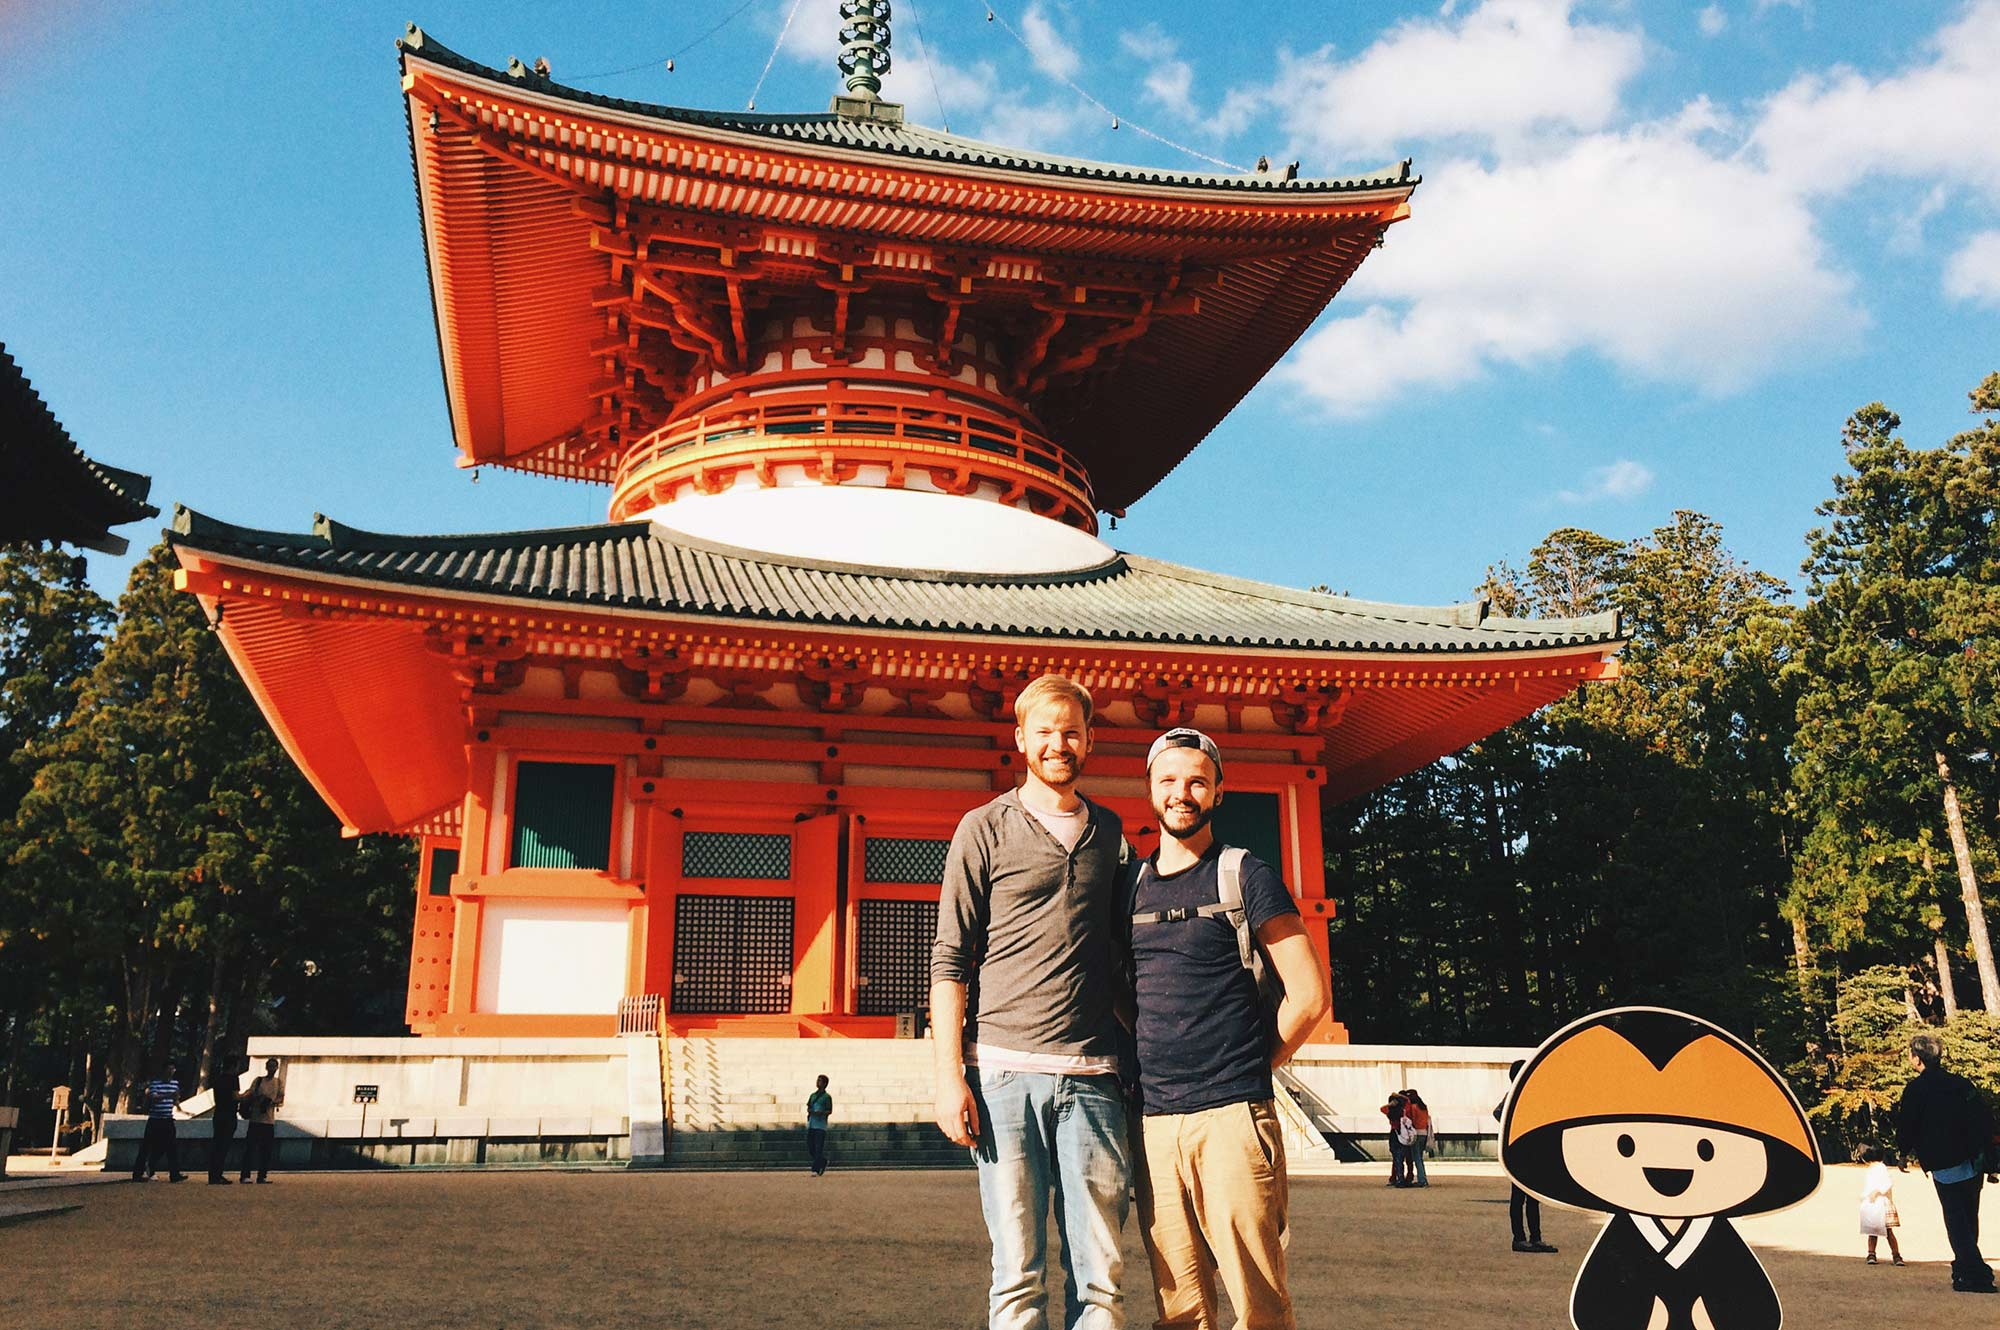 Danjo Garan (壇上伽藍) complex with Konpon Daitō Pagoda | The 120 holy Koyasan temples of Japanese Buddhism at Mount Kõya © CoupleofMen.com